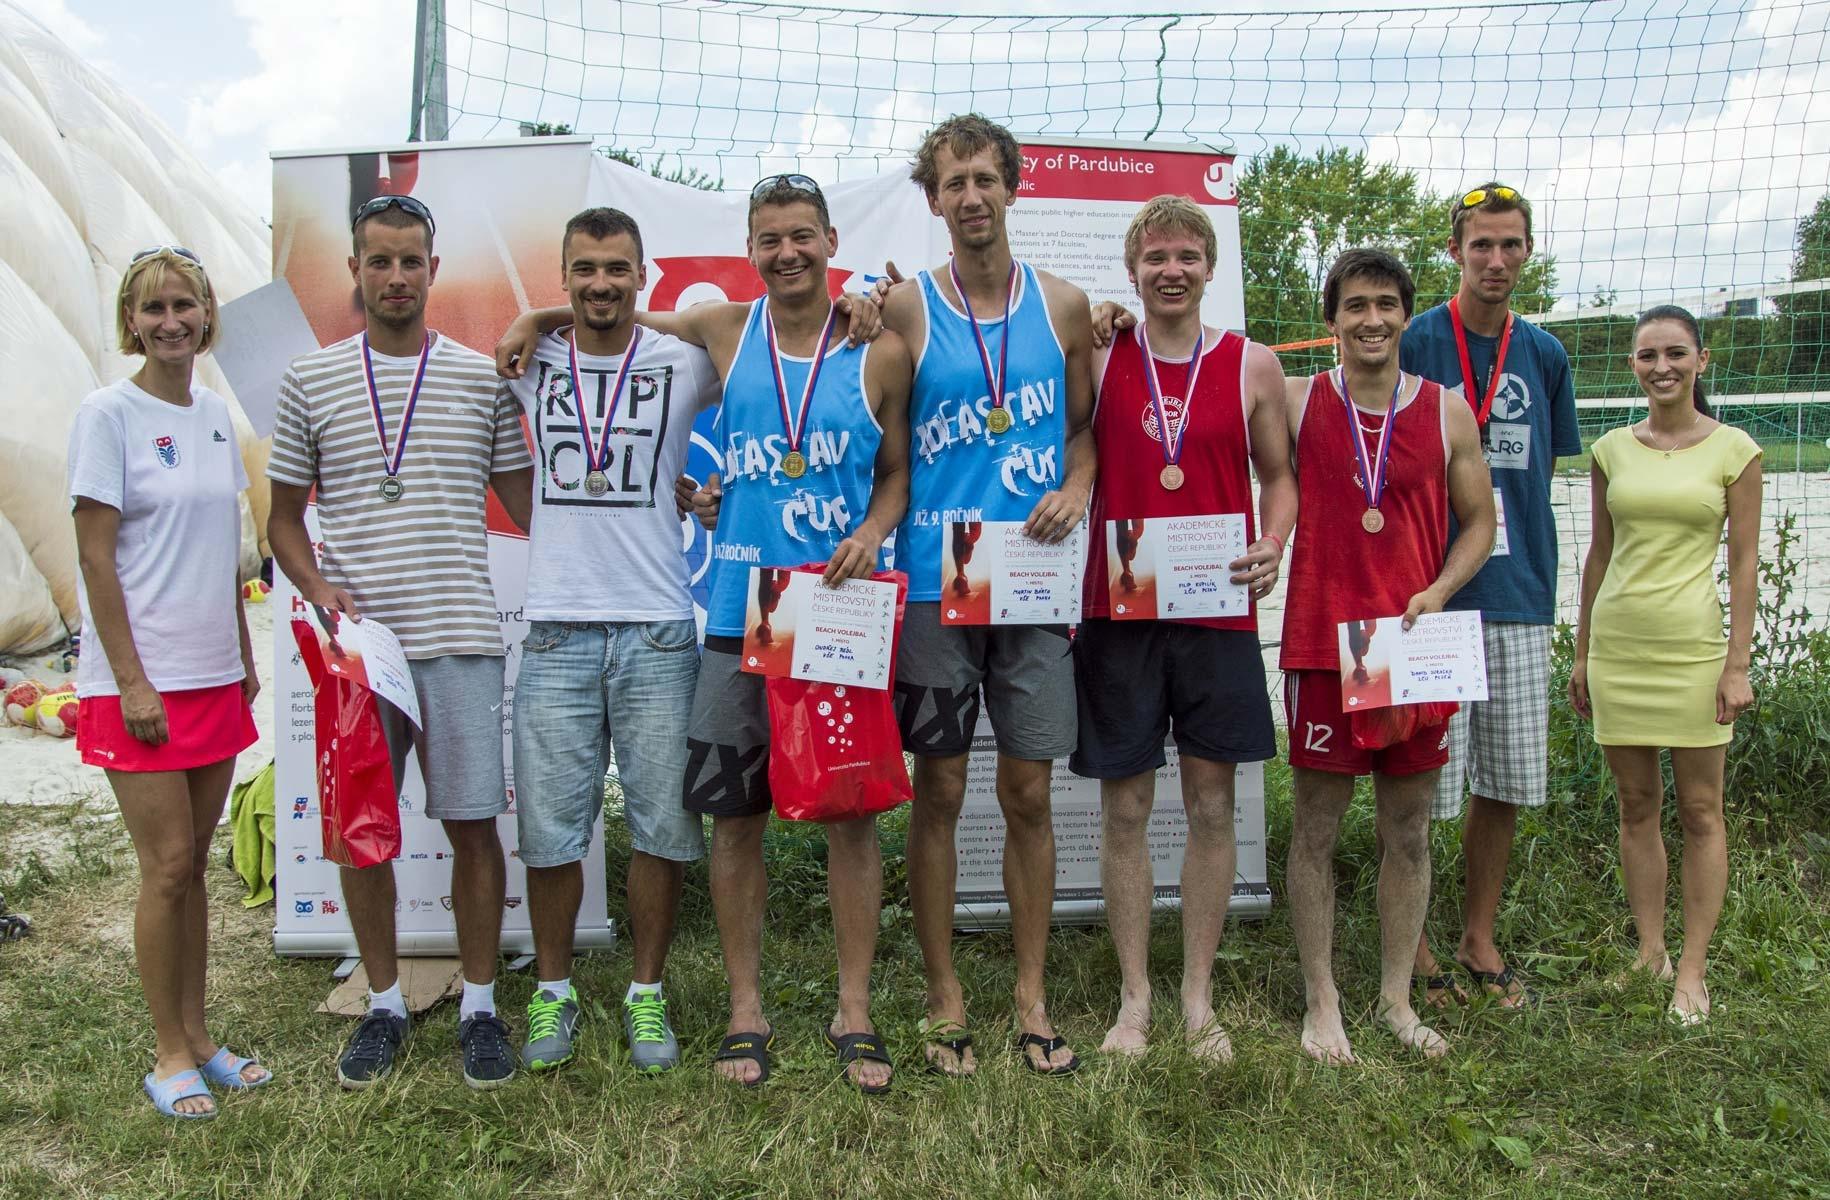 Volejbalová reprezentace VŠE - Beachvolejbalisté ČAH 2016